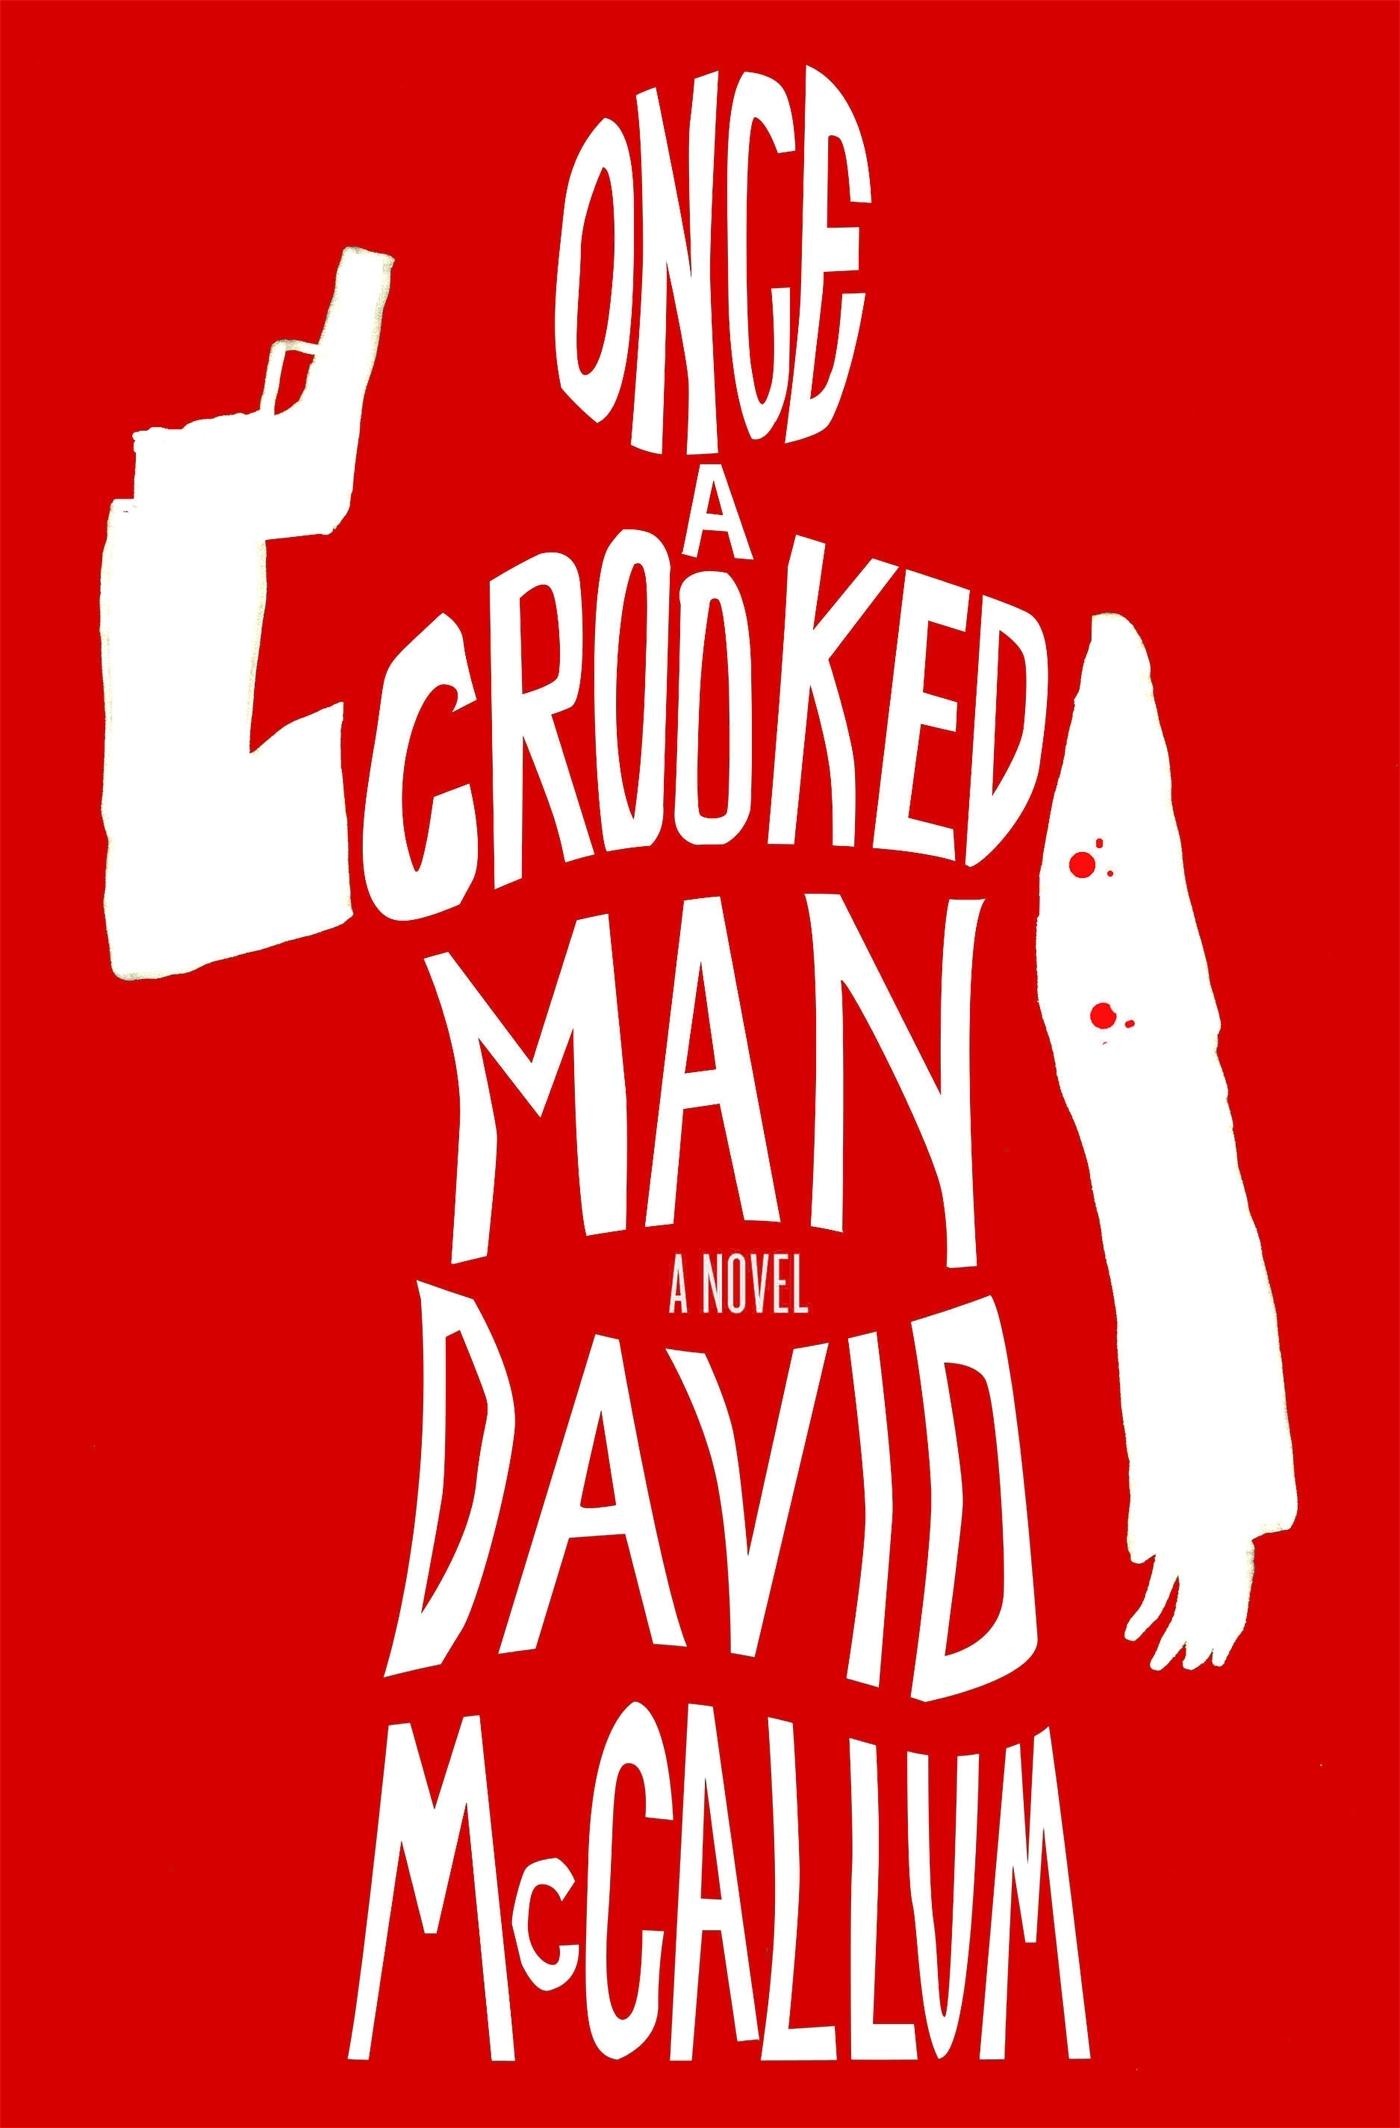 Once a Crooked Man David McCallum